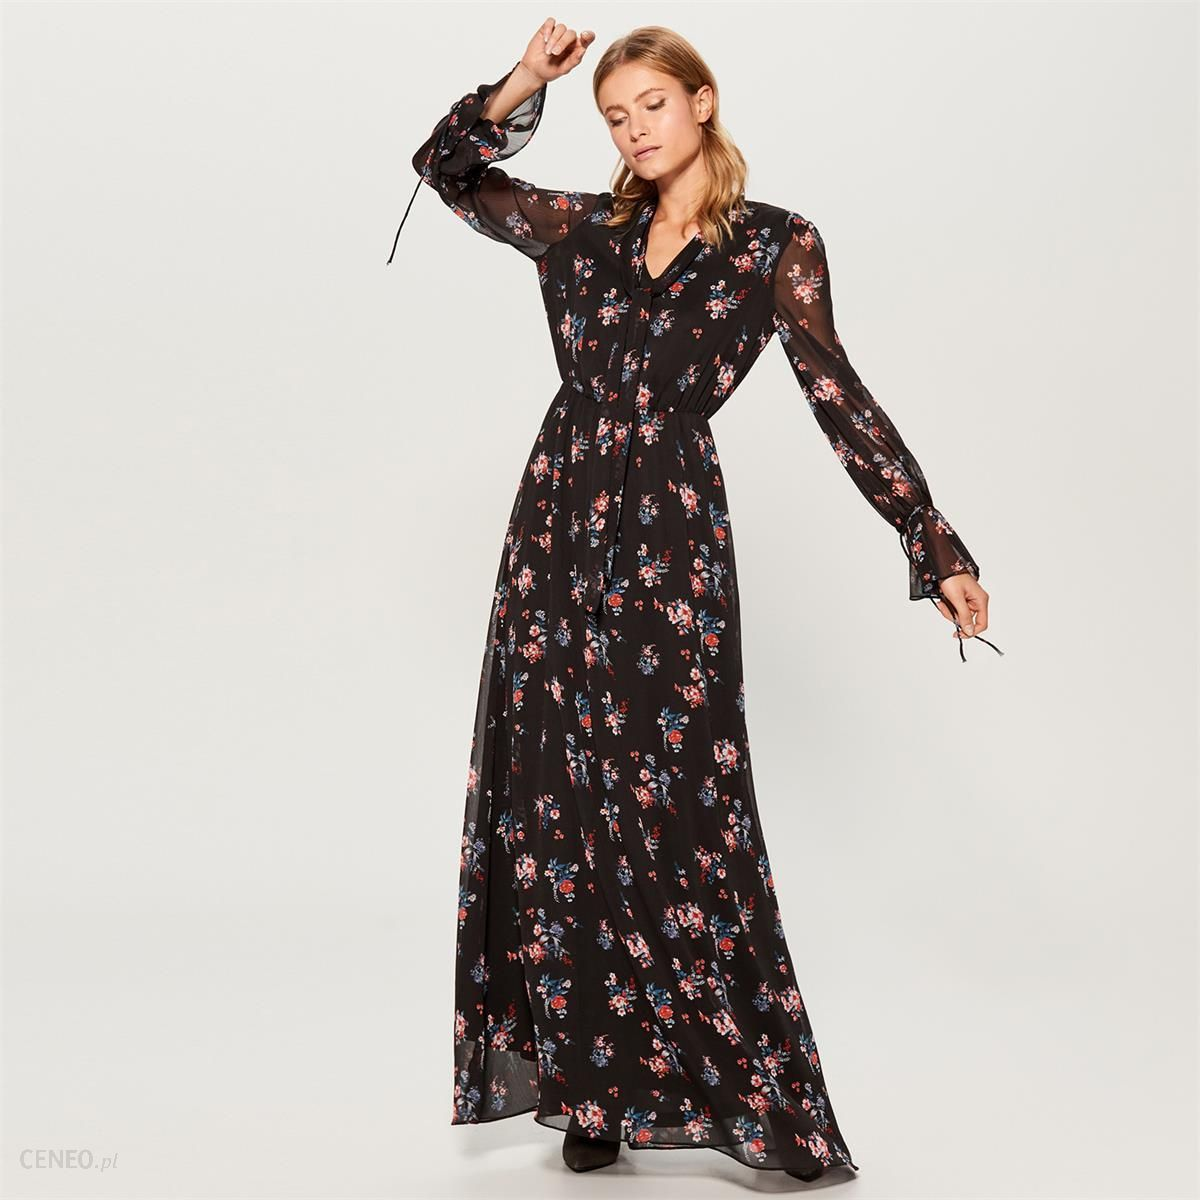 5ec814efa6 Mohito - Szyfonowa sukienka maxi gold label - Wielobarwn - Ceny i ...